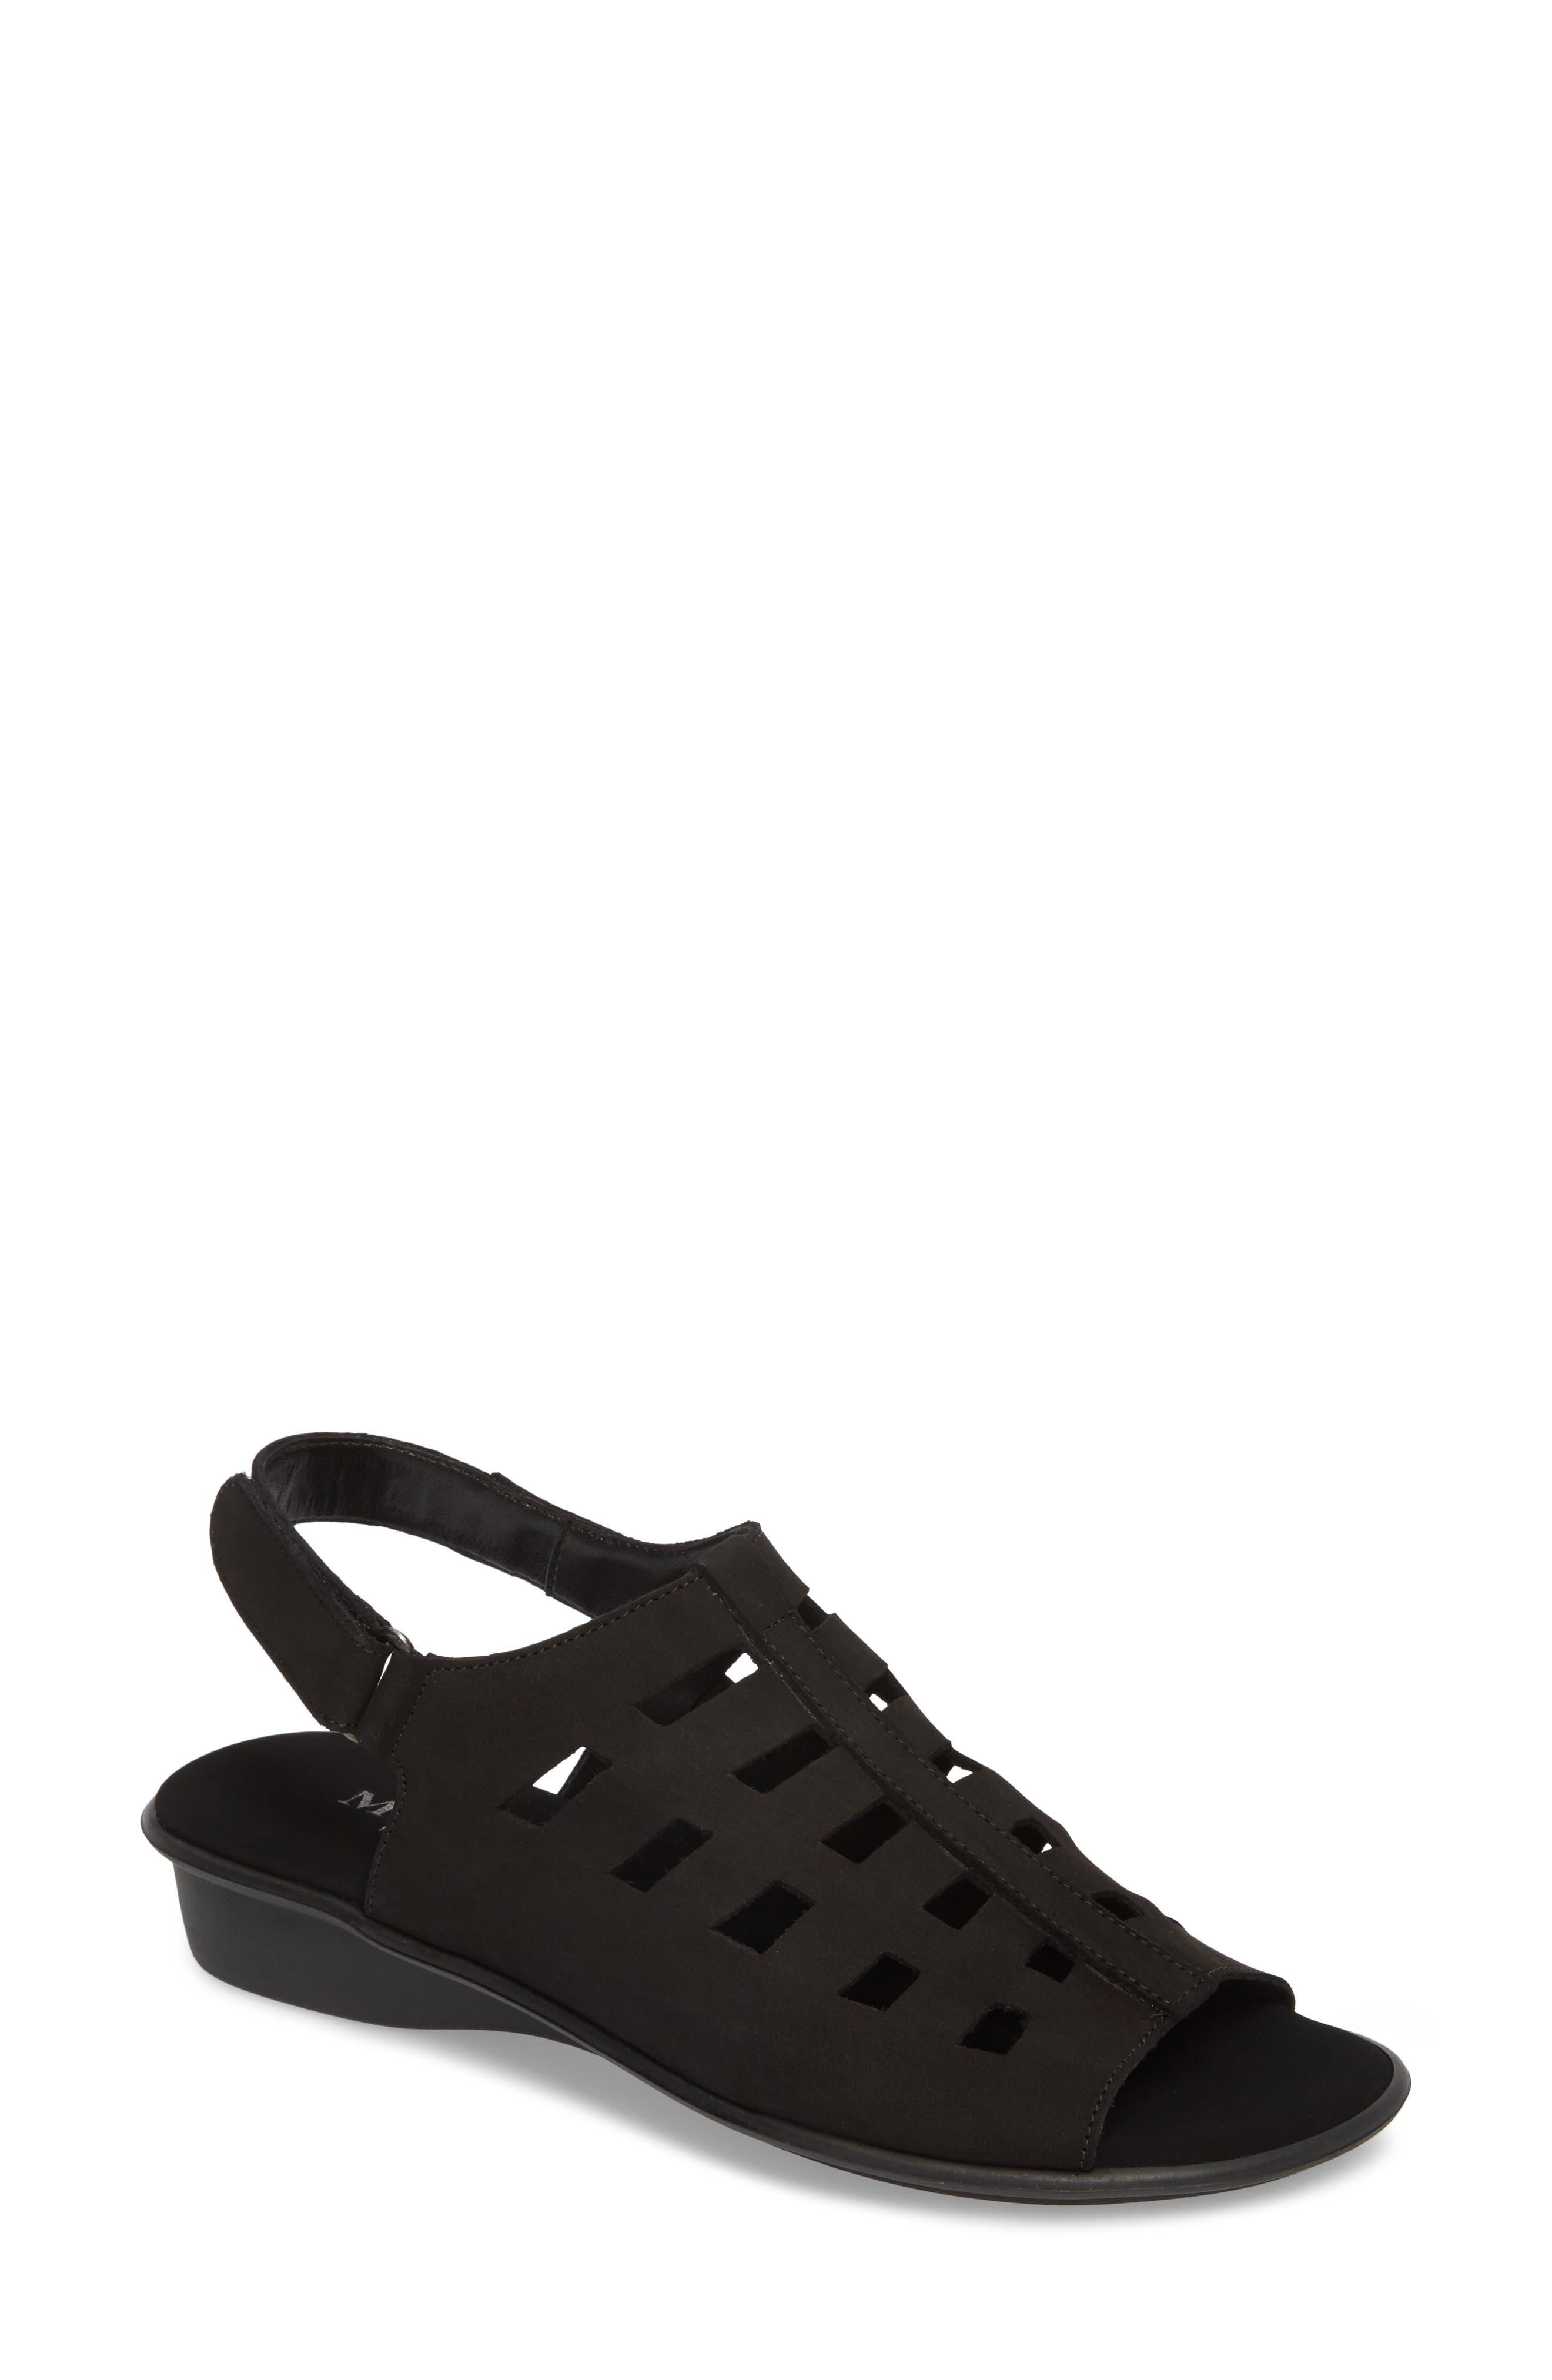 Elita Cutout Slingback Sandal,                         Main,                         color, BLACK NUBUCK